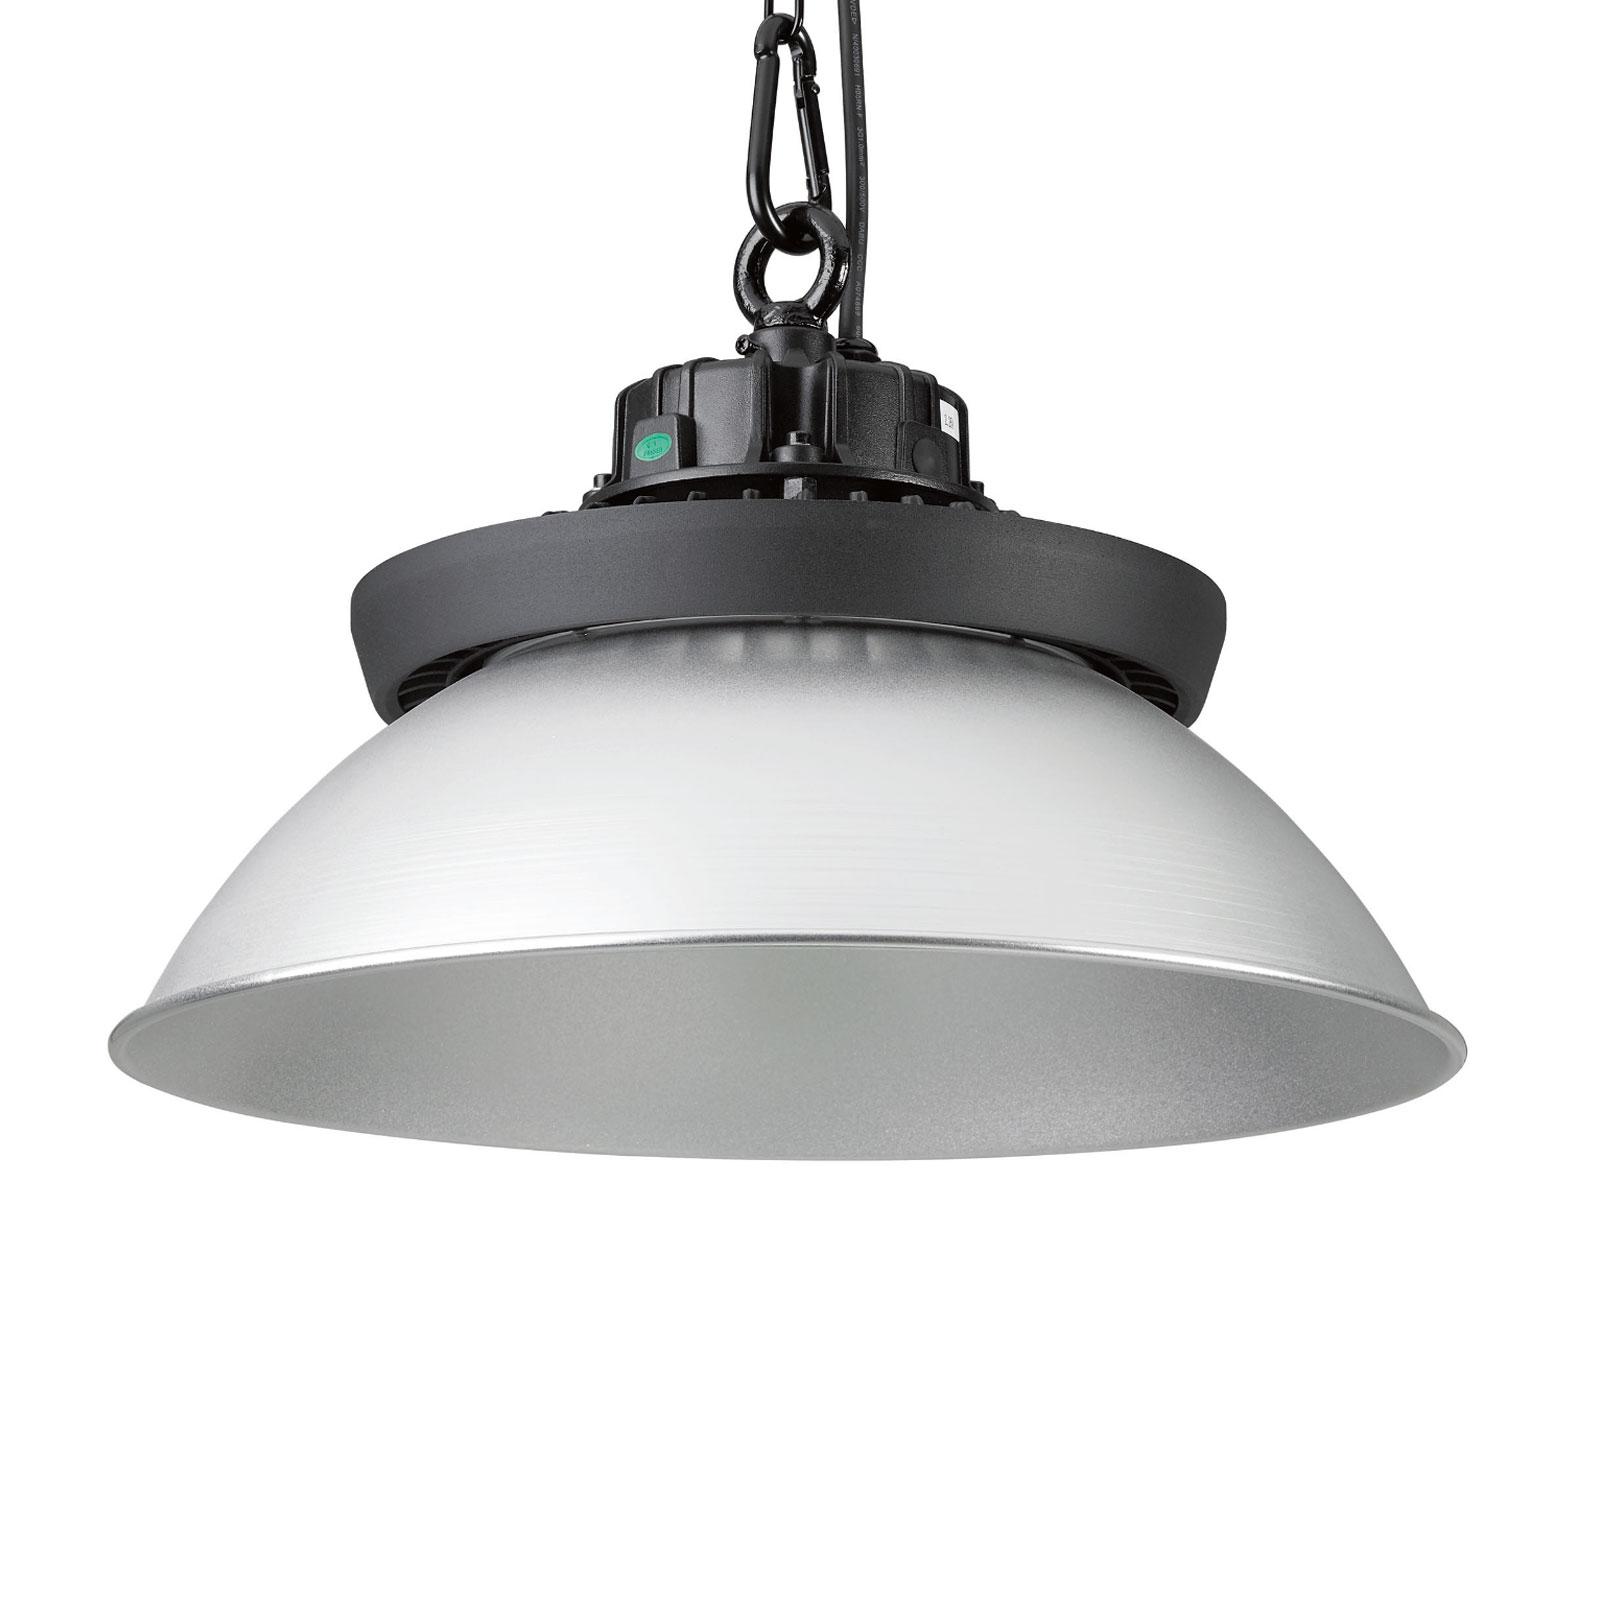 Reflektor für Highbay Start 13/19KLM aluminium